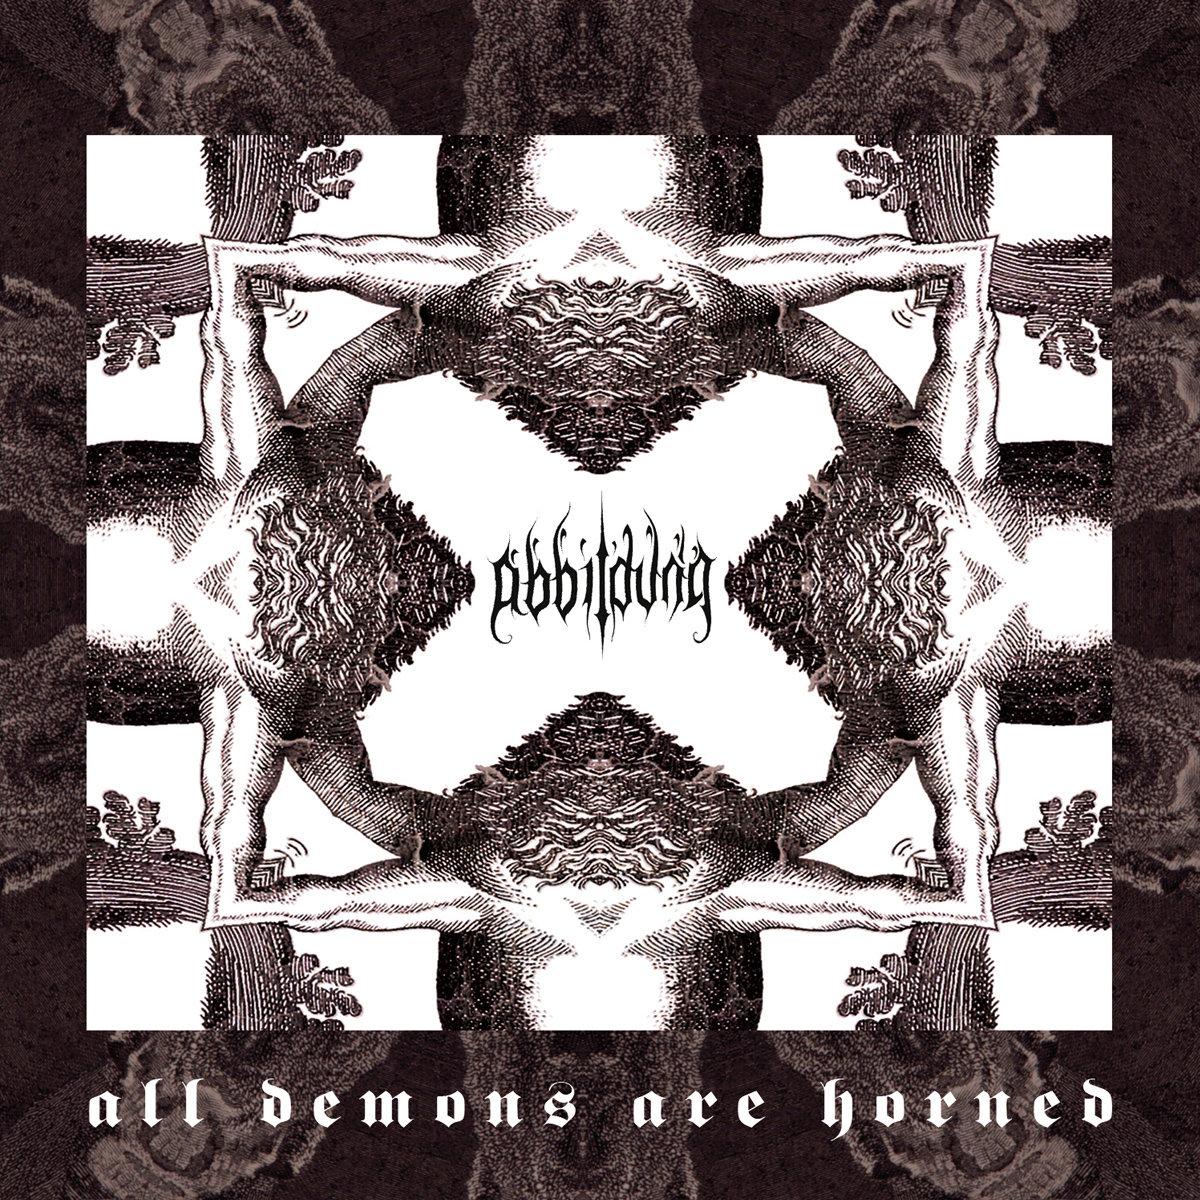 Abbildung: All Demons Are Horned 【予約受付中】